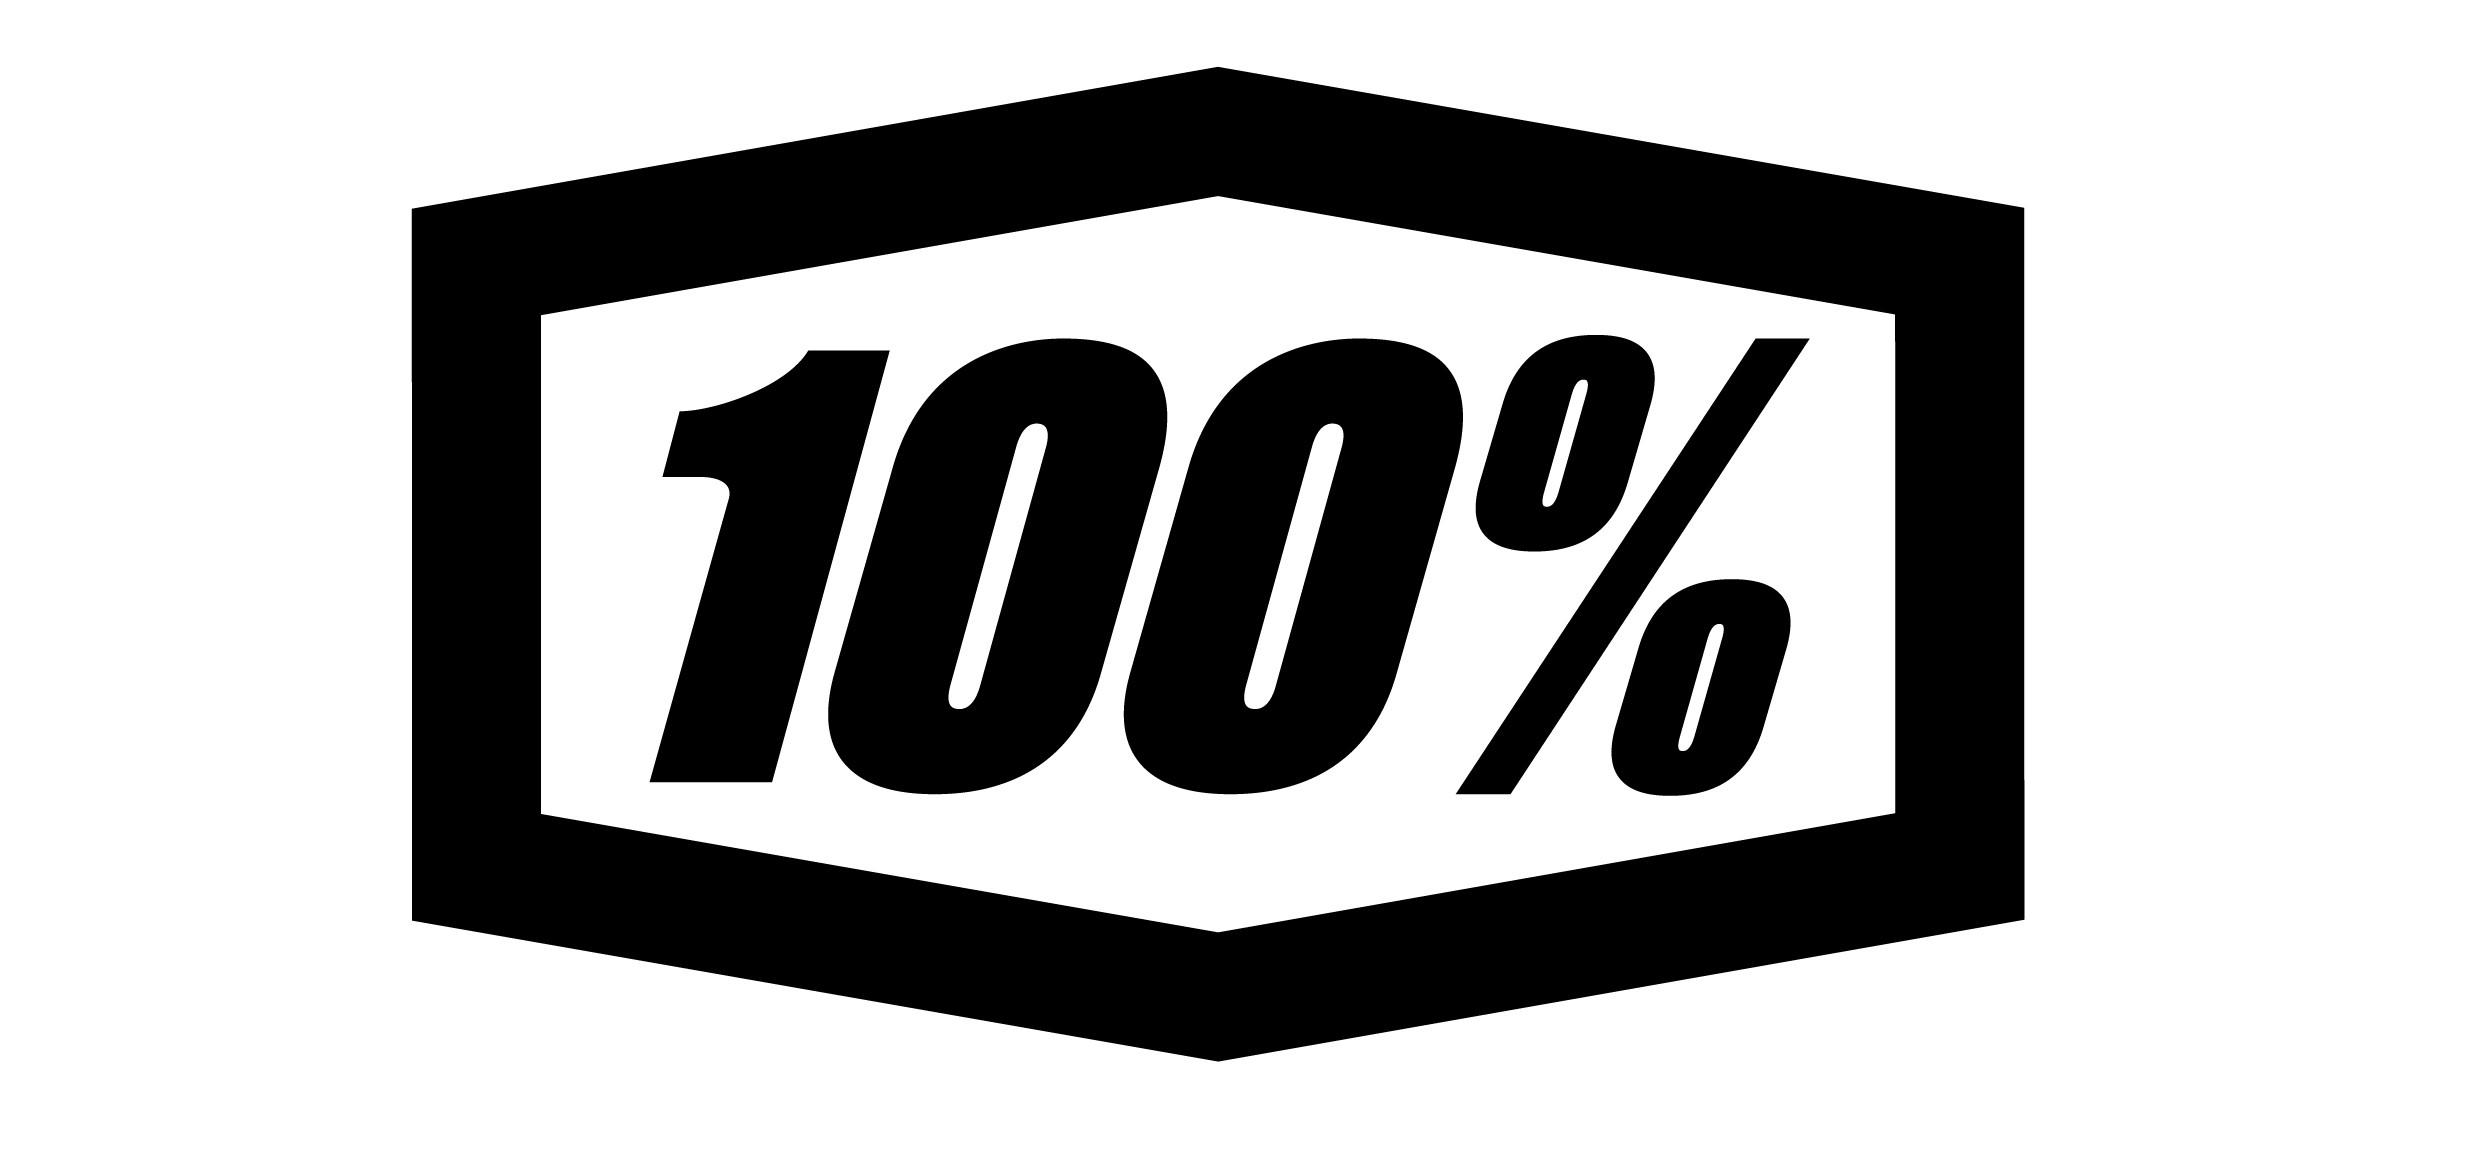 100percento